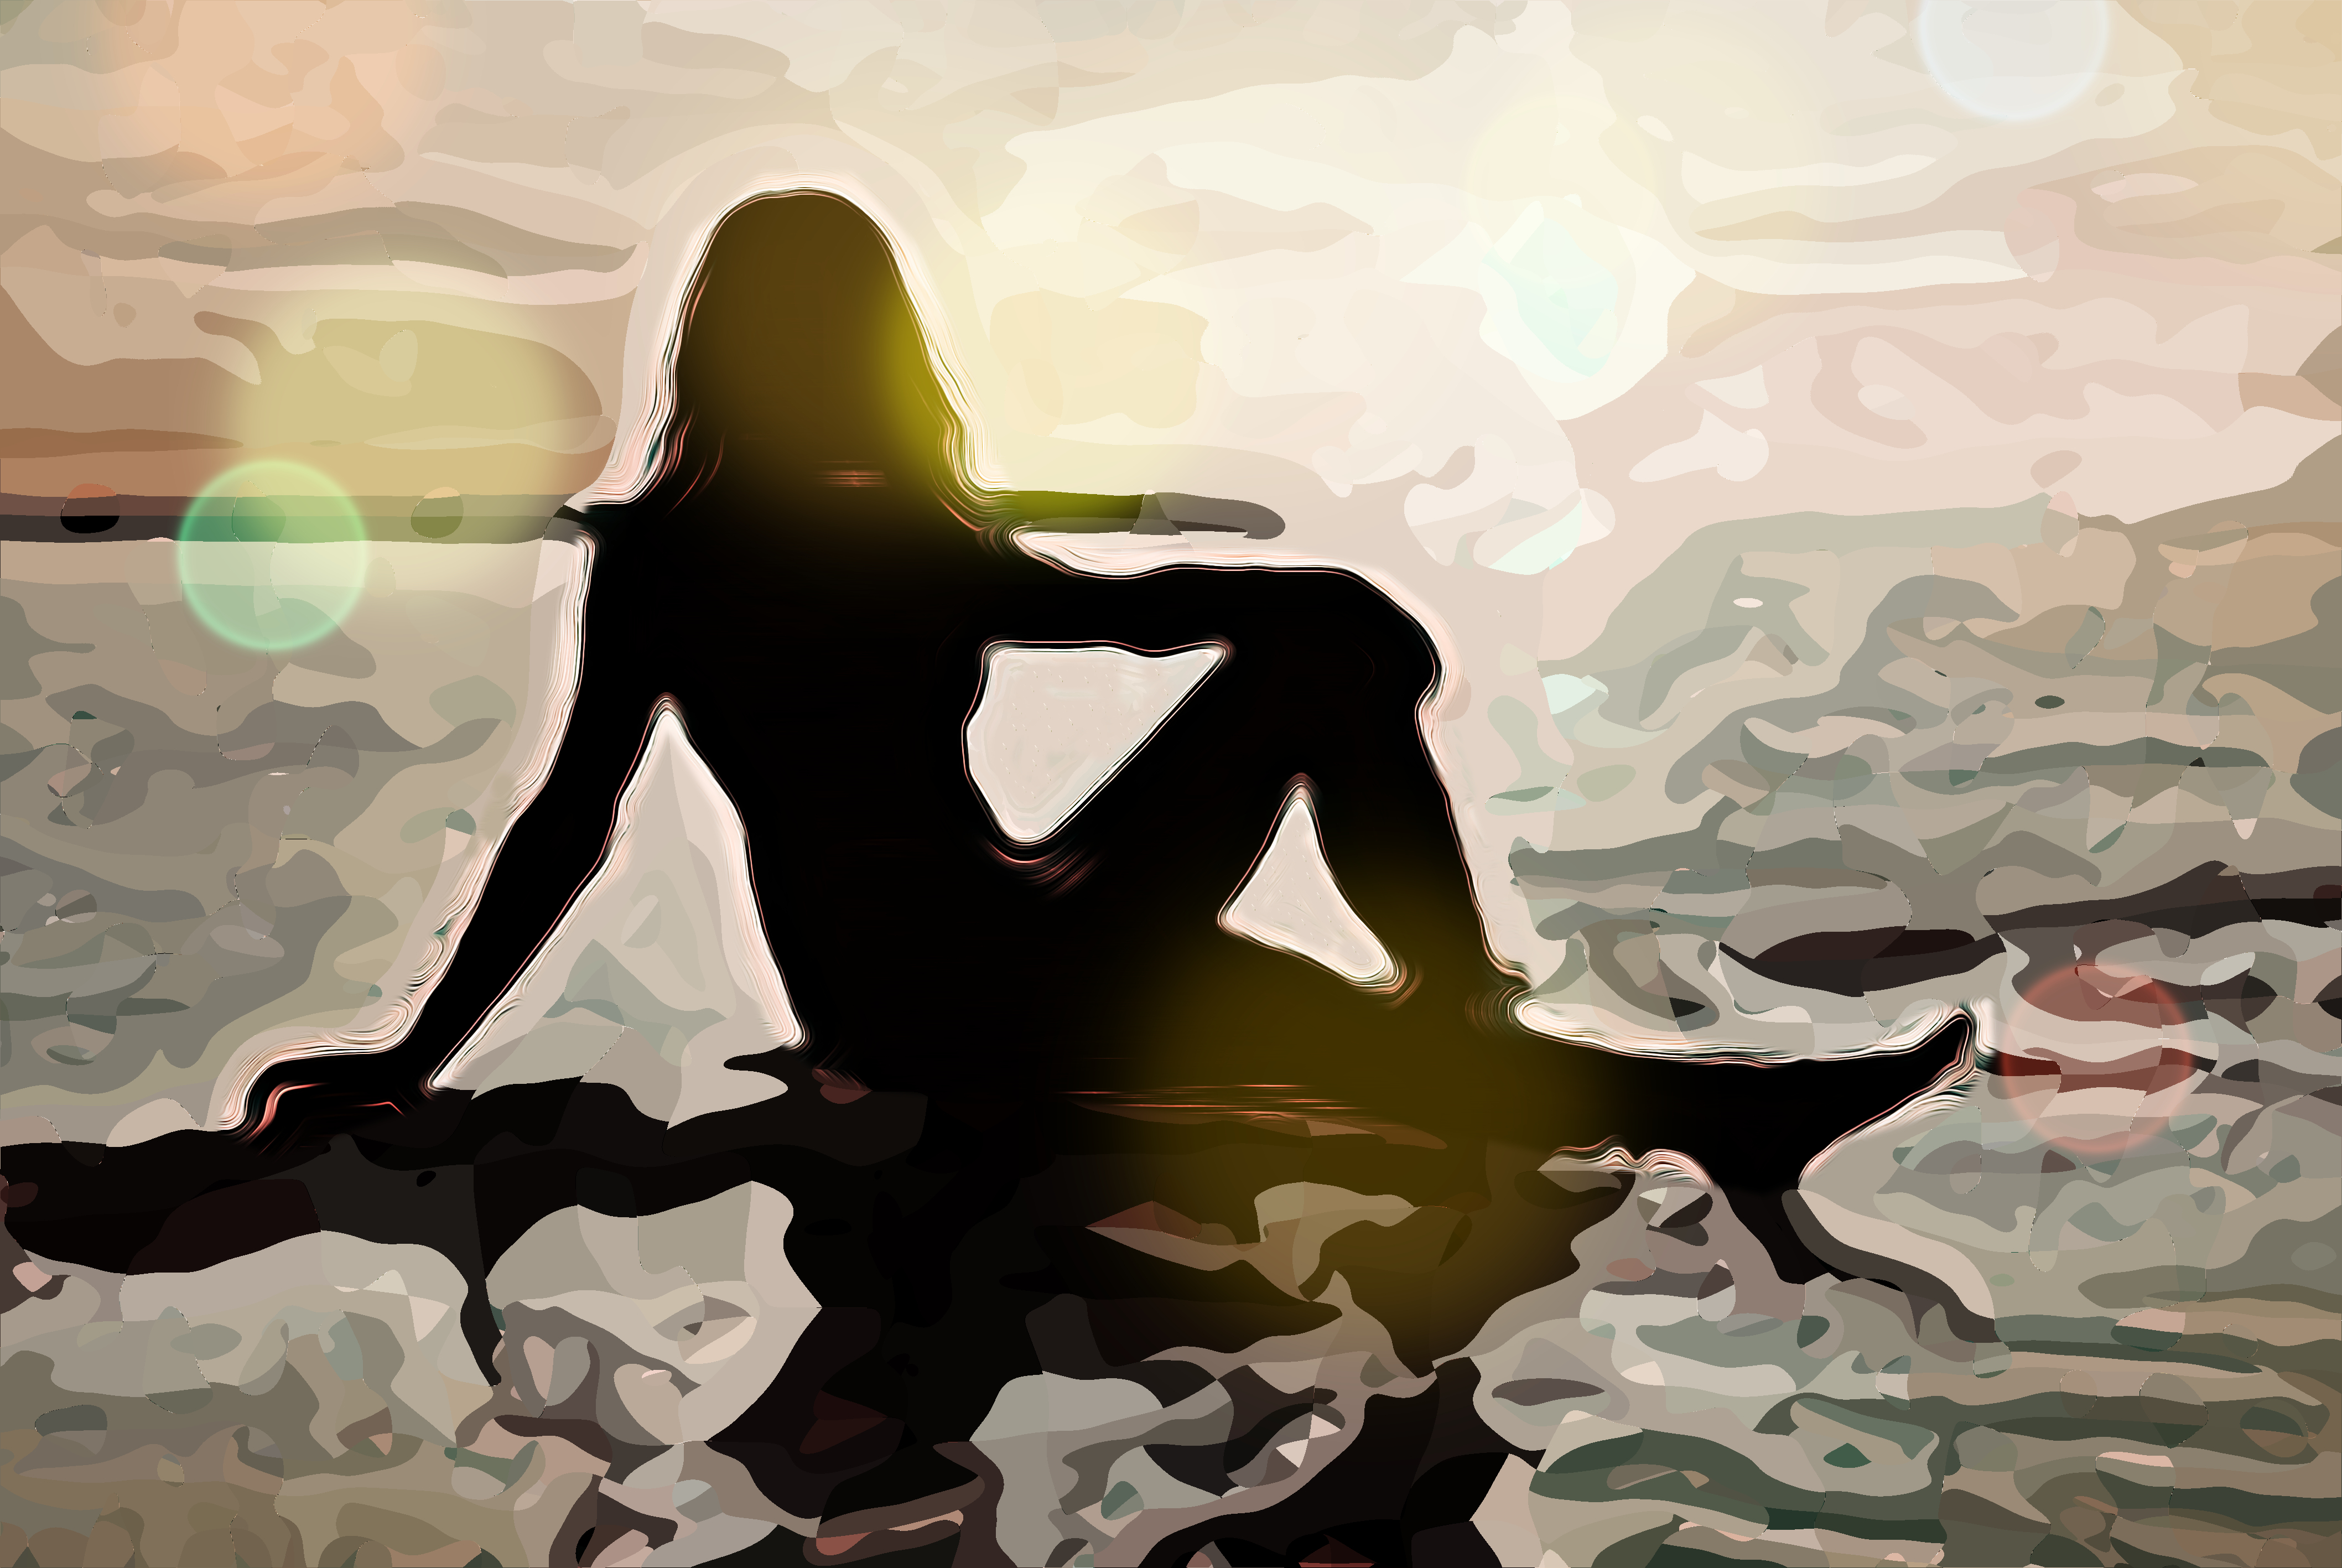 Stella, pittura digitale di Francesco Galgani, 10 ottobre 2020